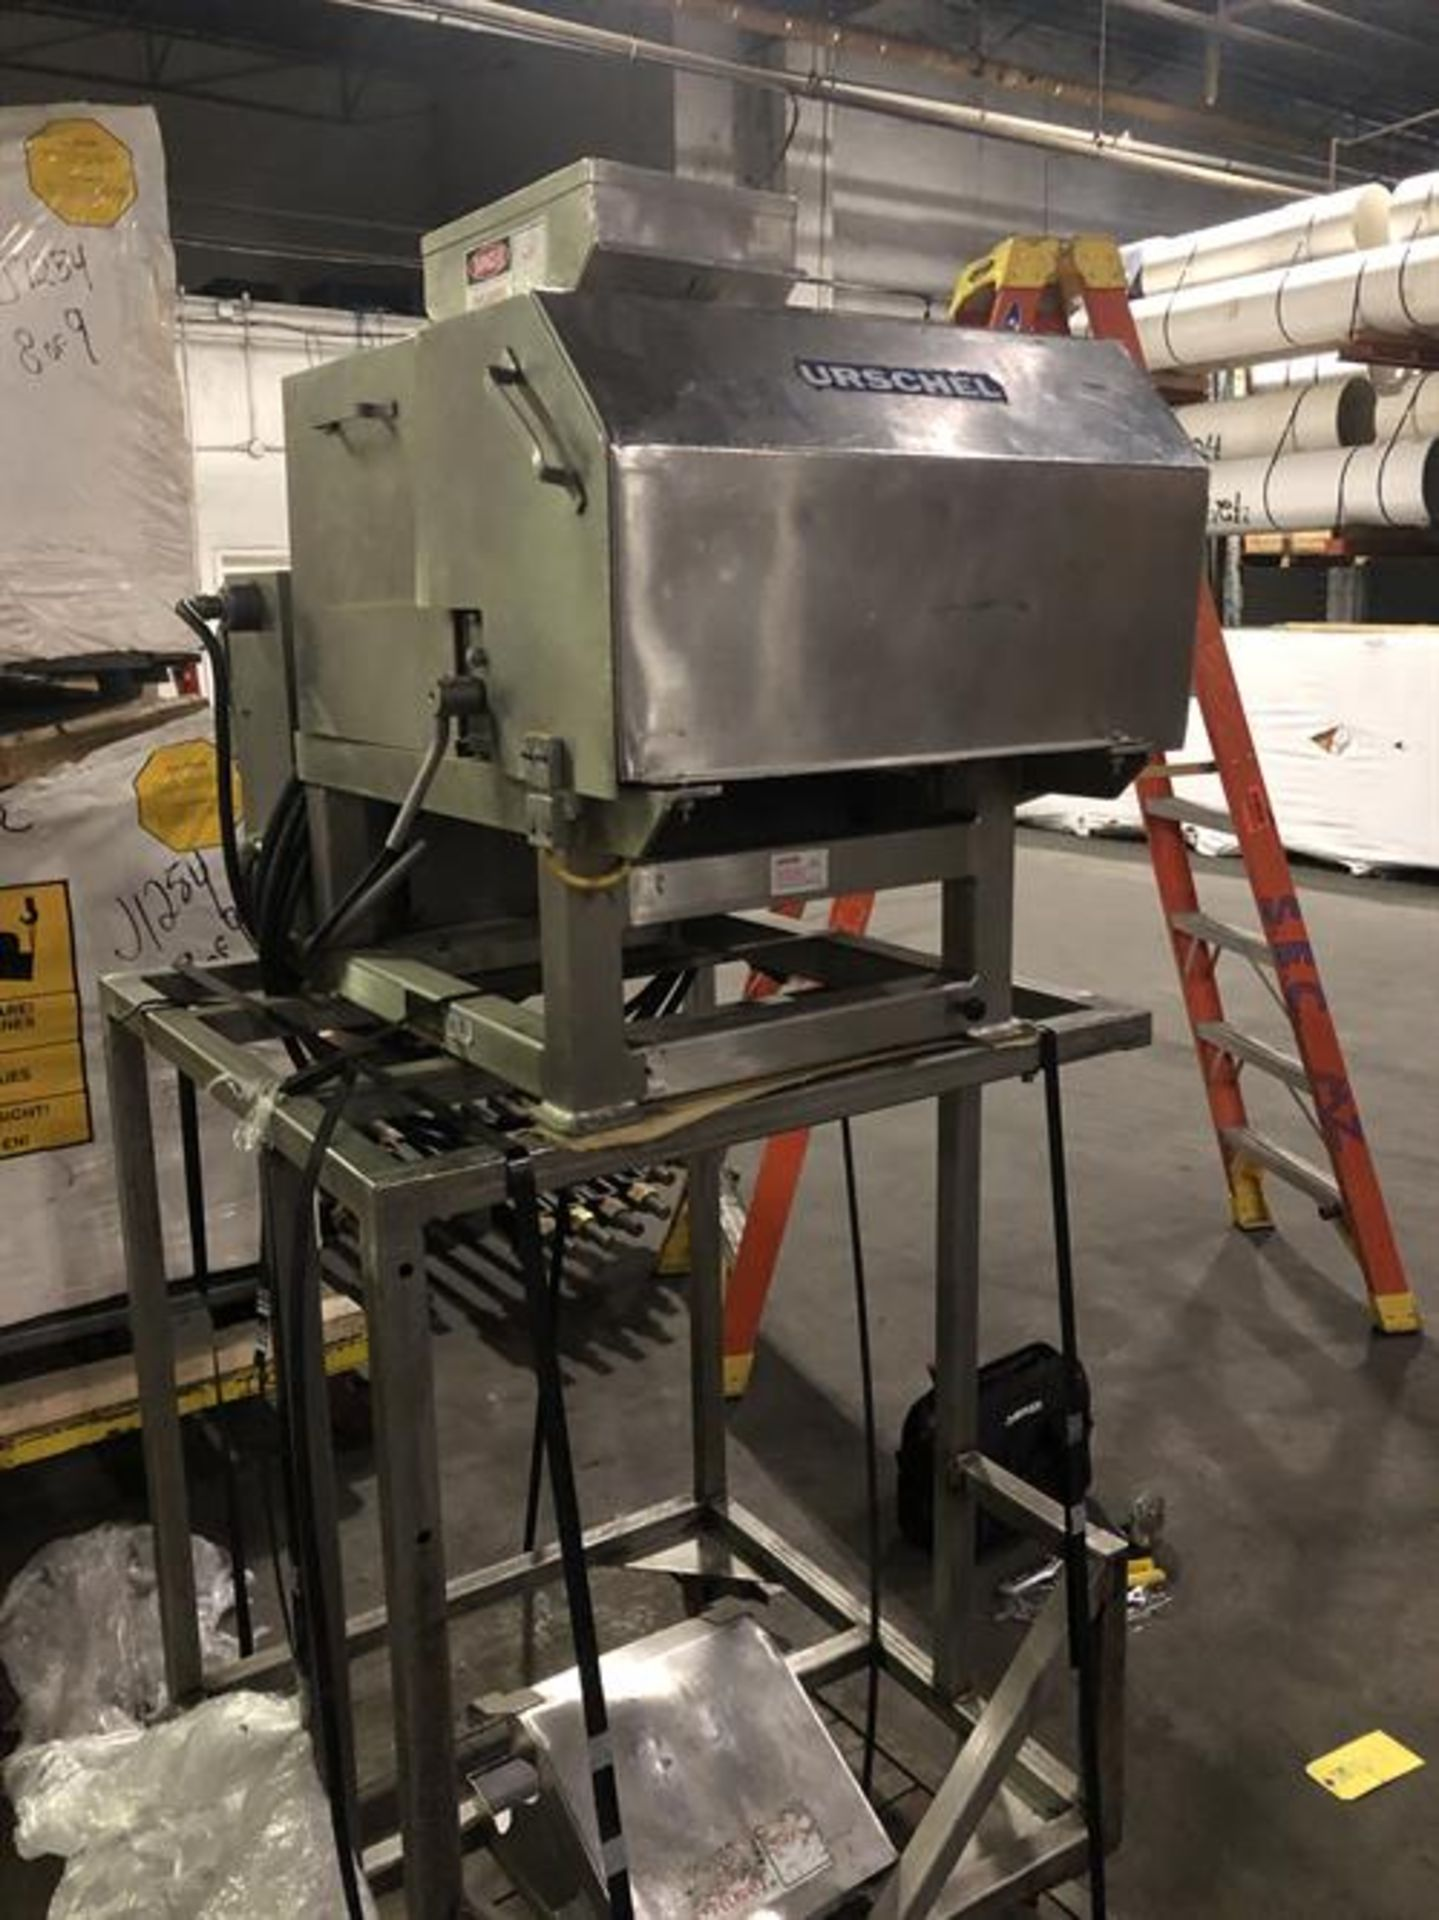 Urschel model N Stainless Steel Granulator - Vibrator pan feeder with variable speed rheostat - - Image 13 of 18